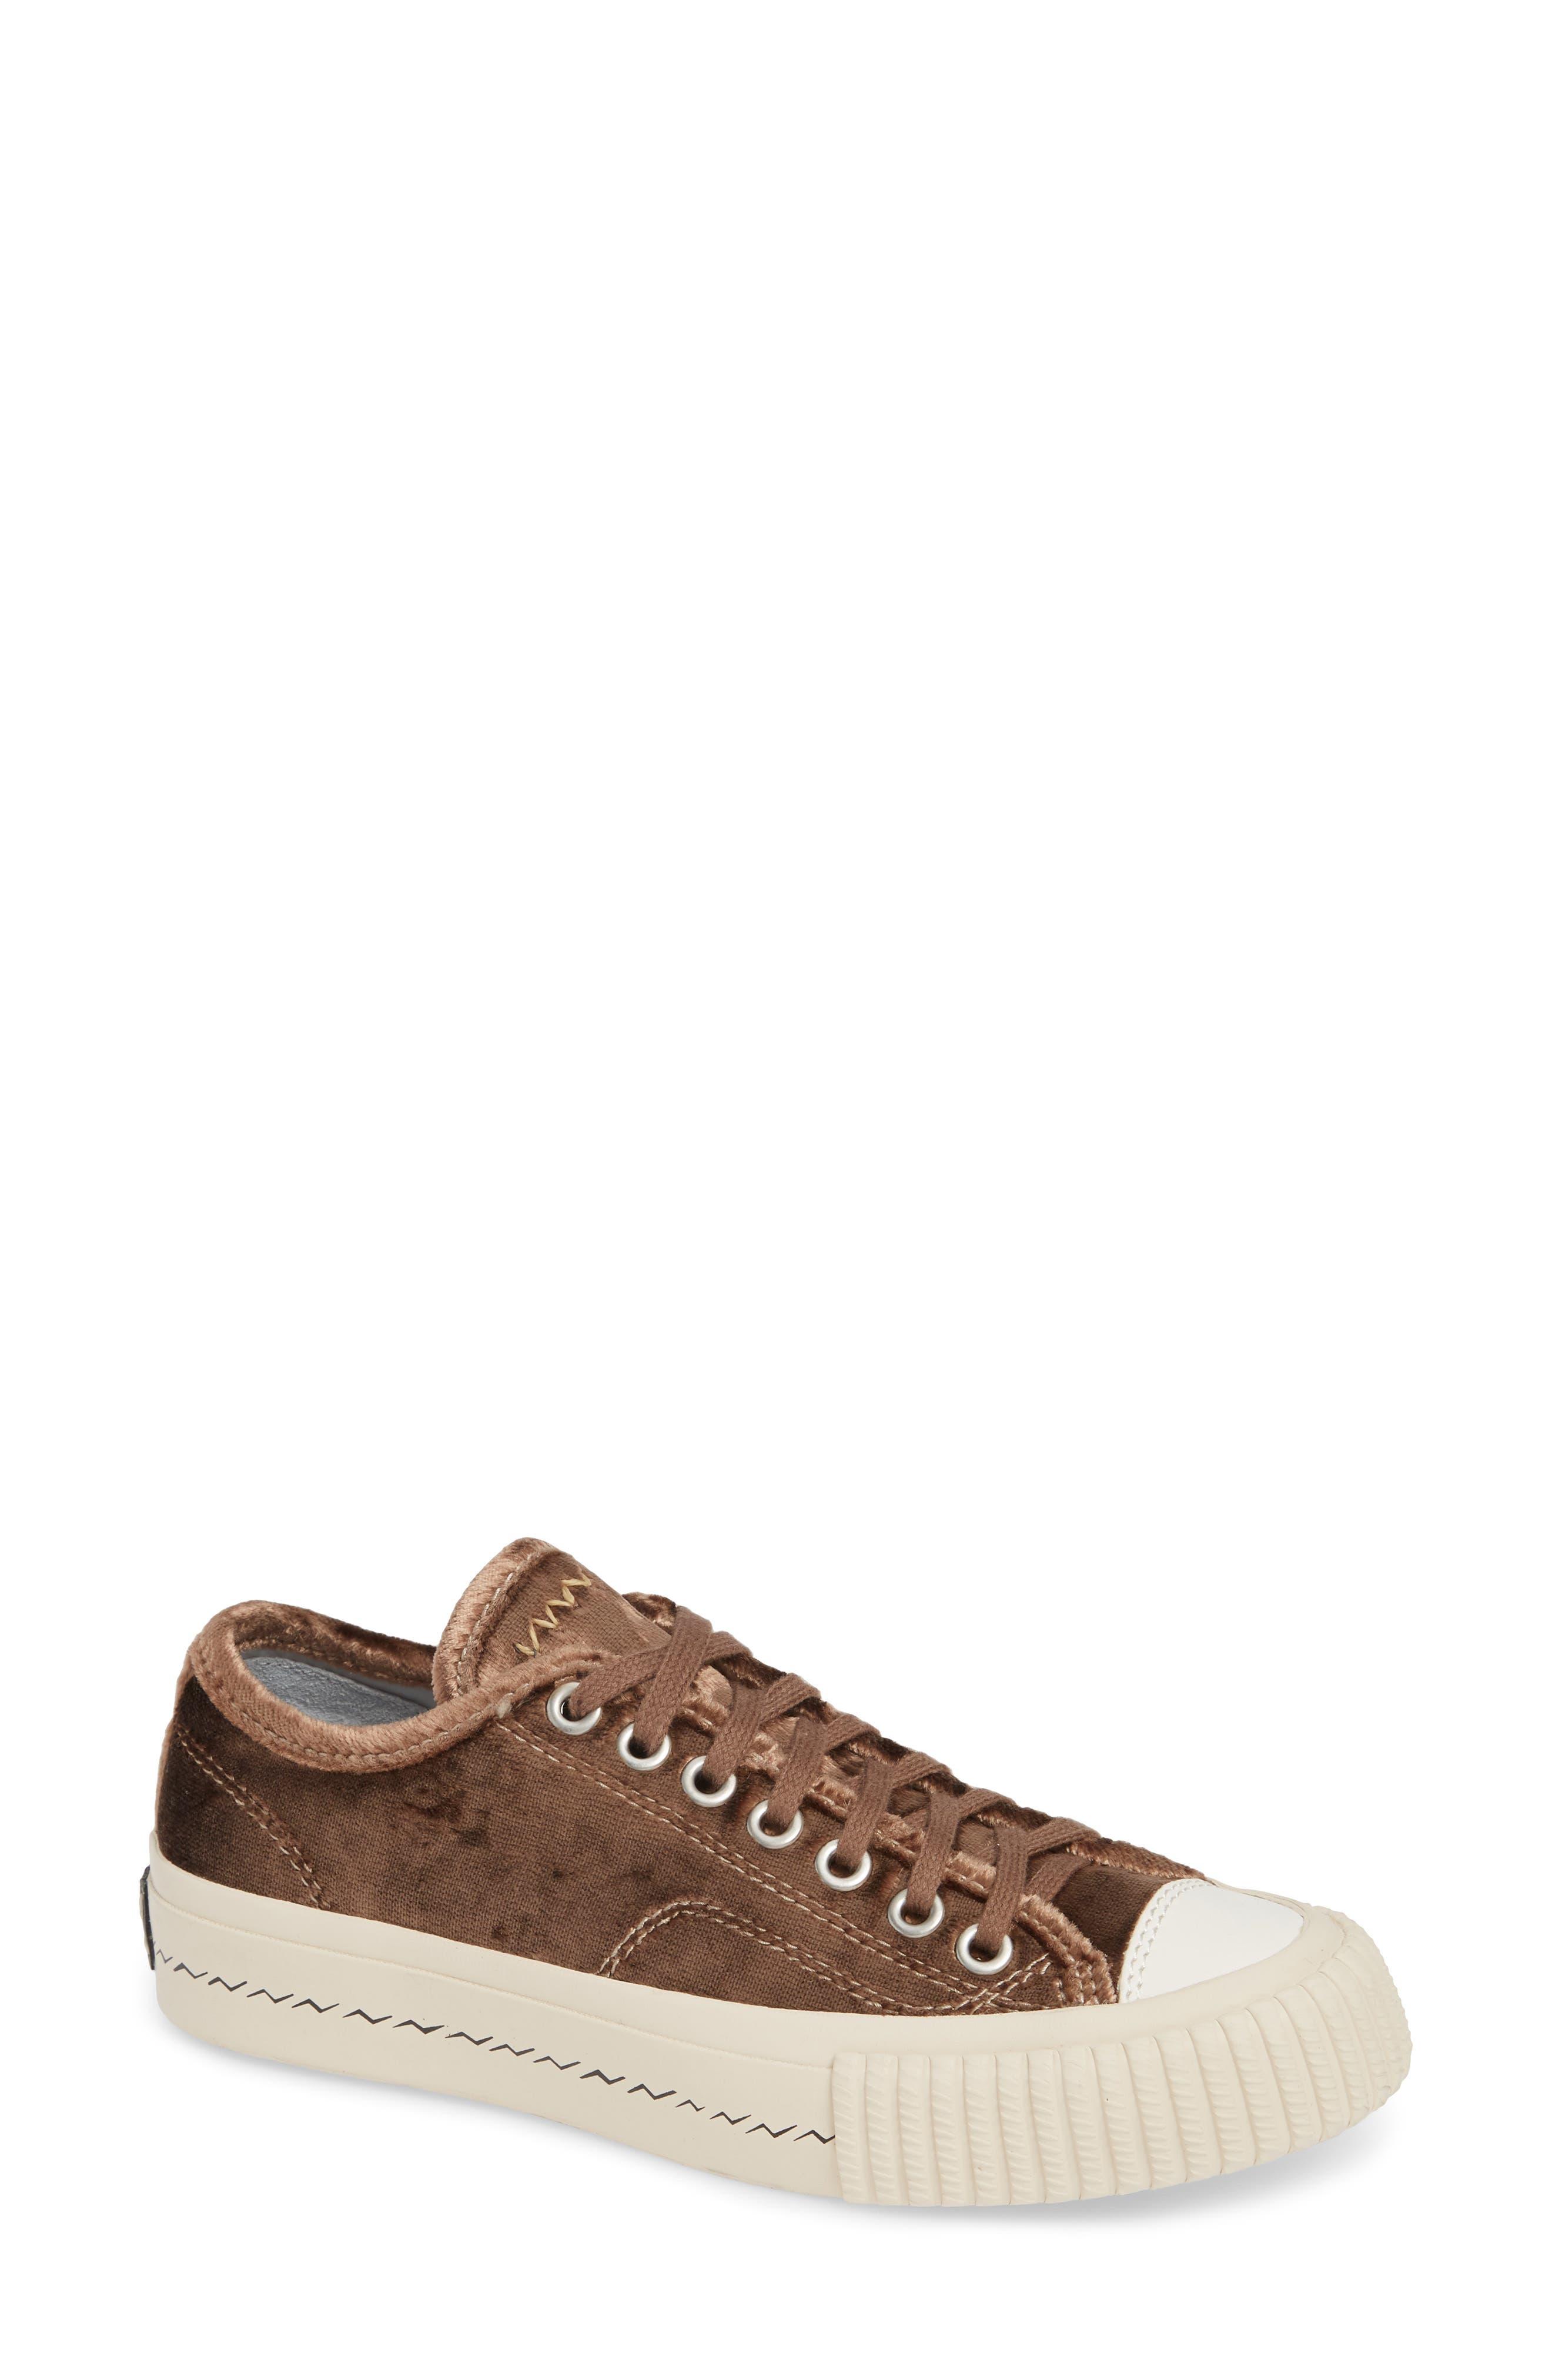 Skagway Lo Sneaker,                         Main,                         color, BROWN